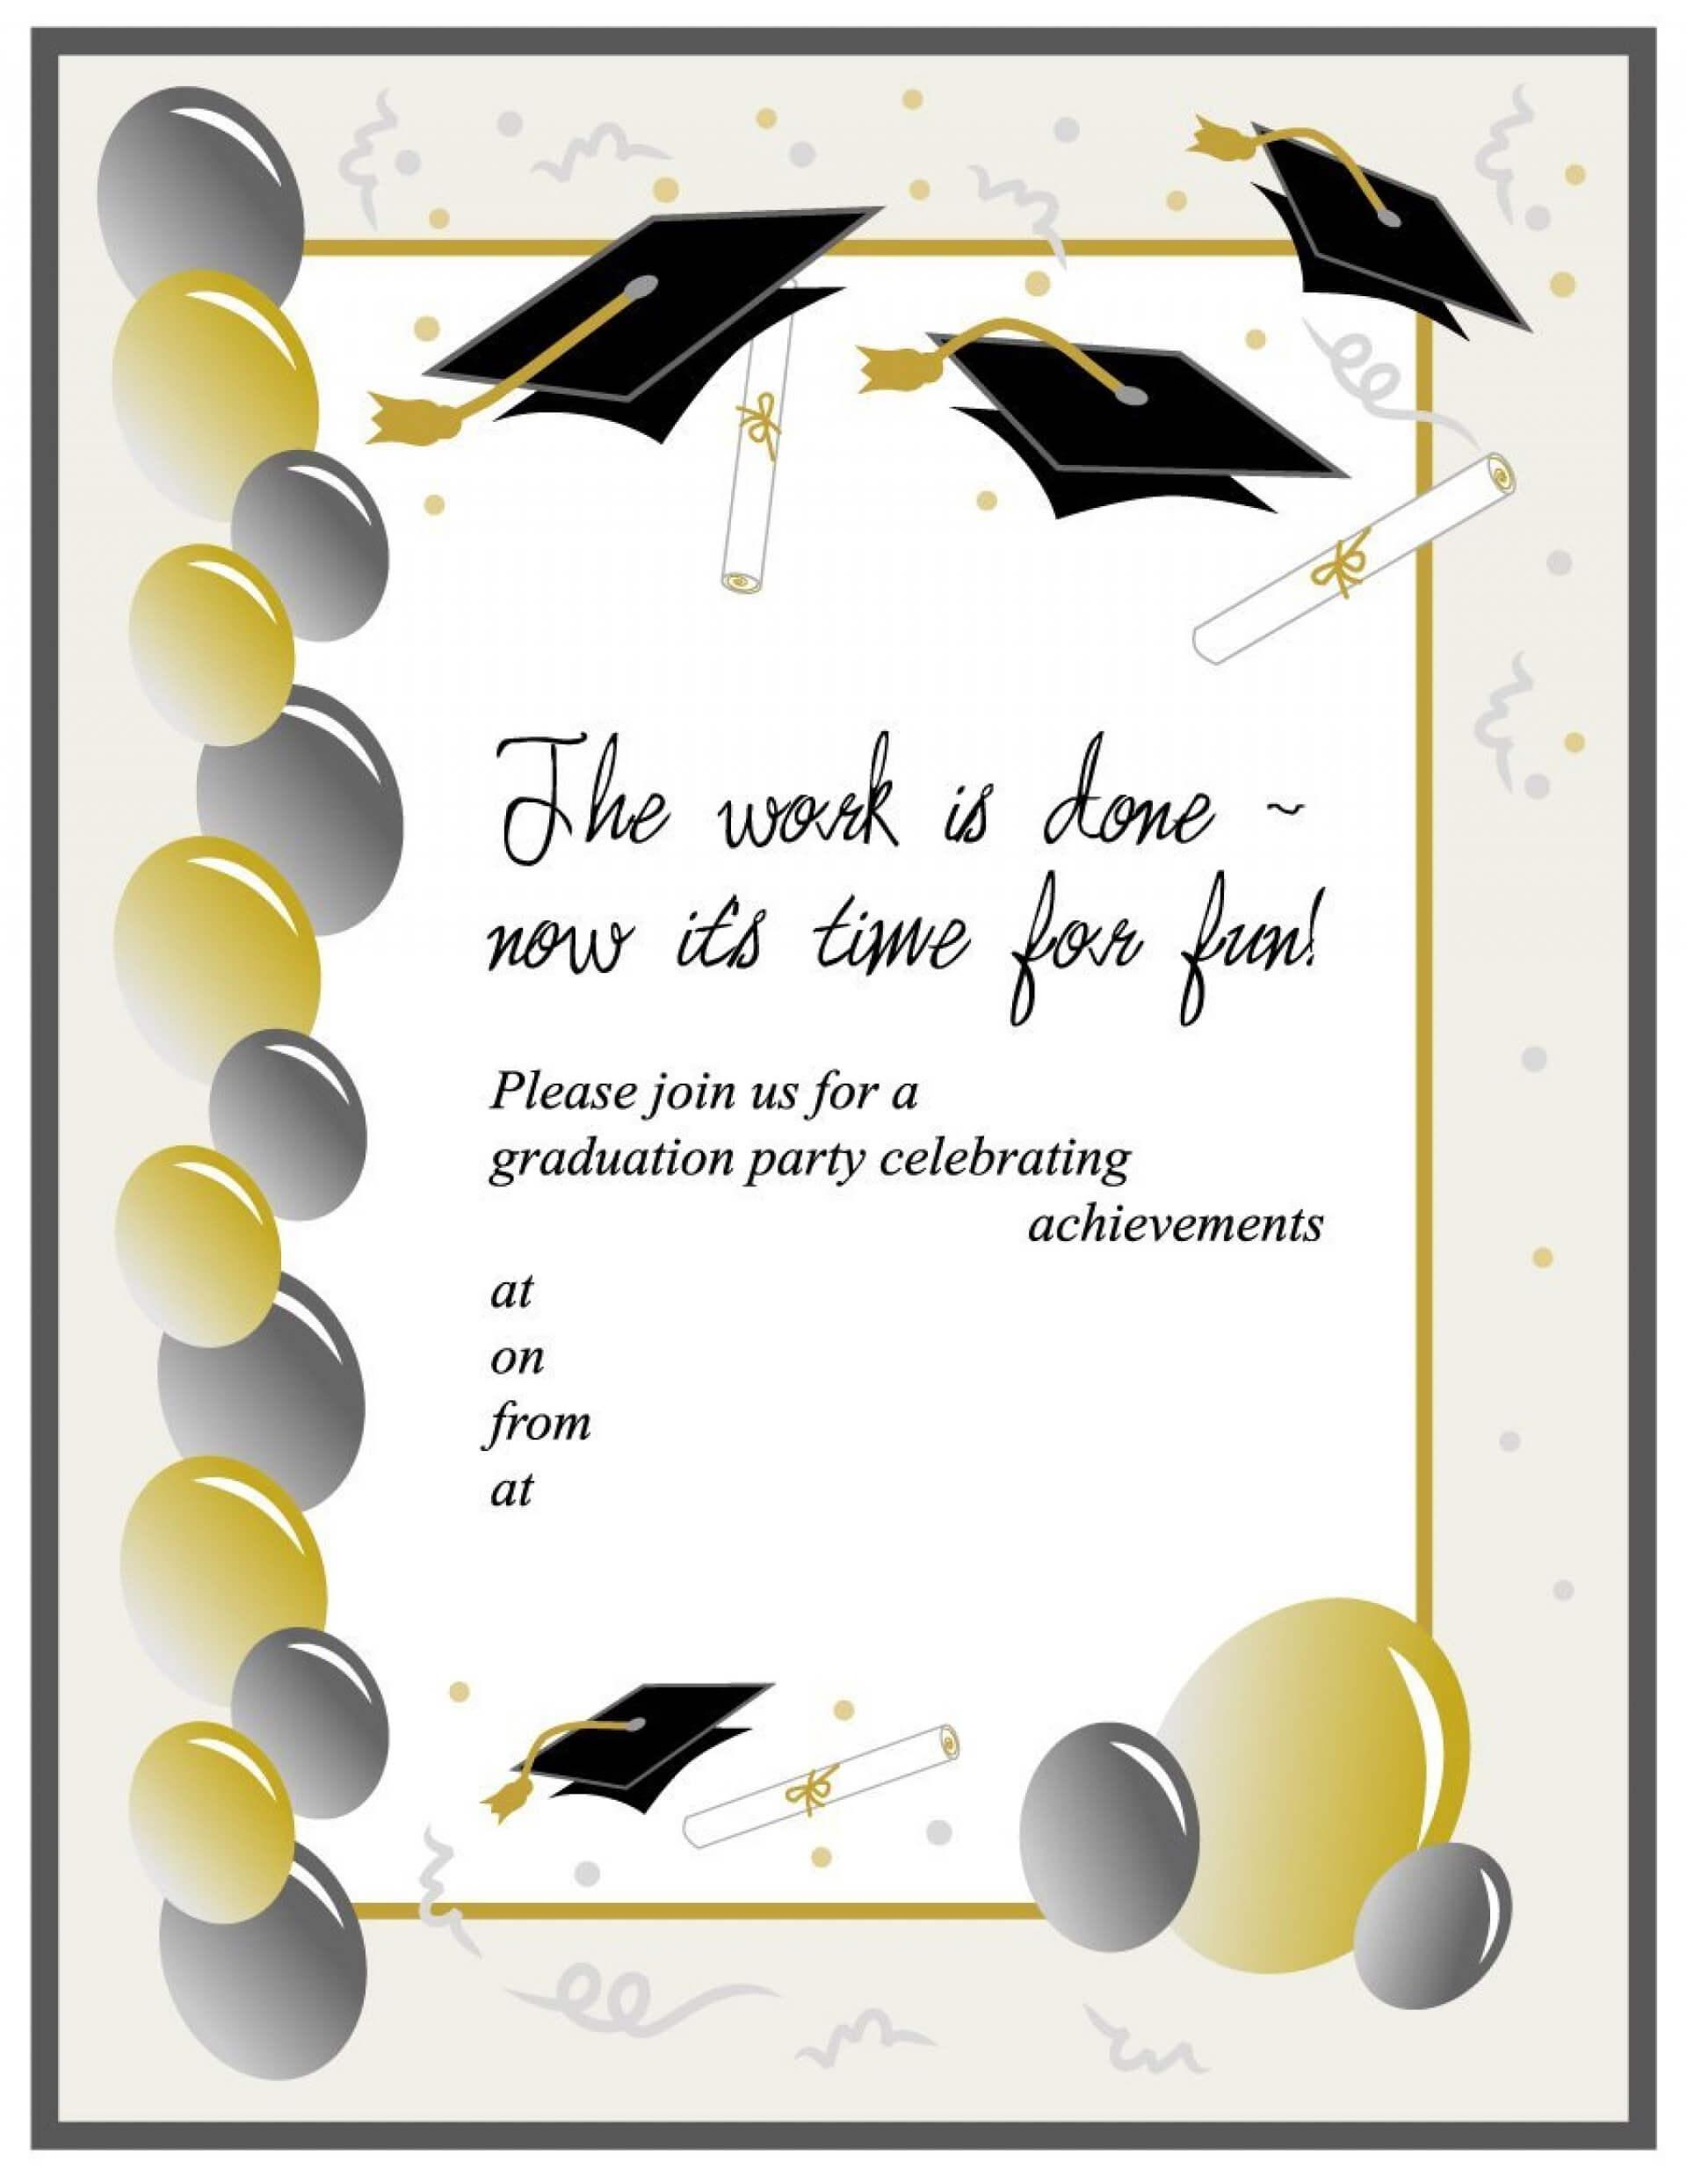 012 Graduation Invitation Templates Template Ideas Party With Free Graduation Invitation Templates For Word